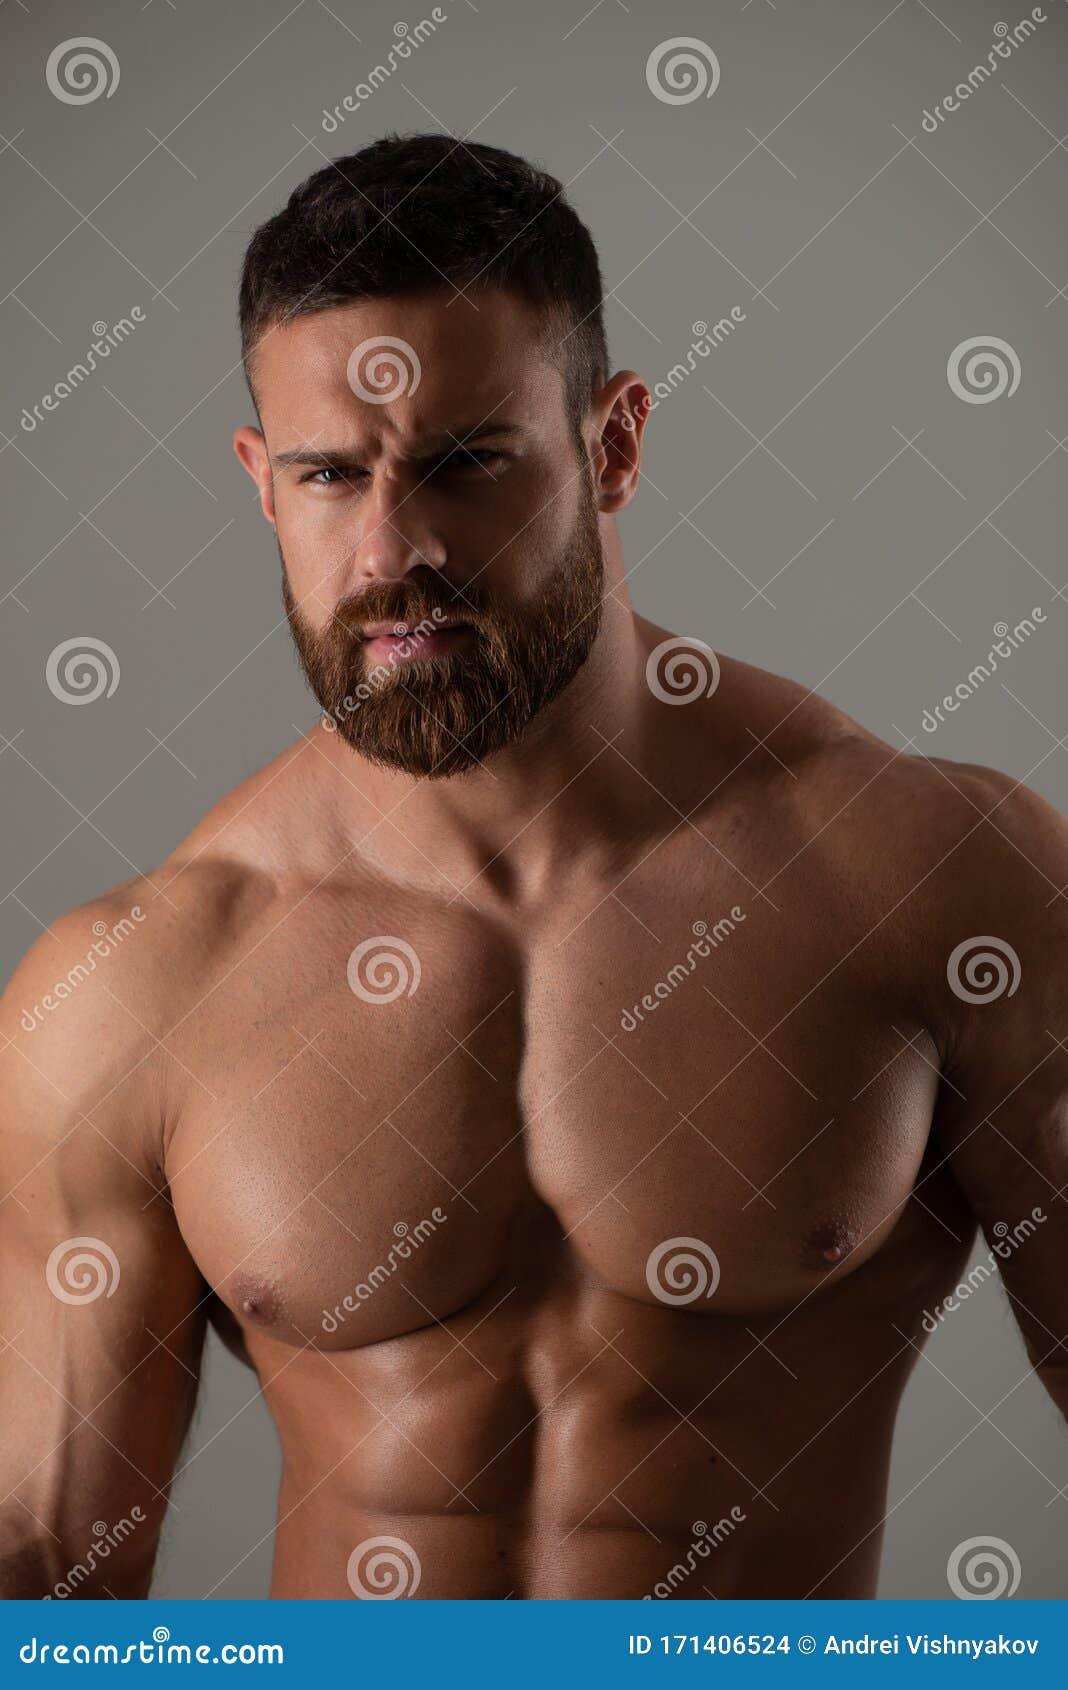 Male Teenage Bodybuilder Stock Photo - Download Image Now